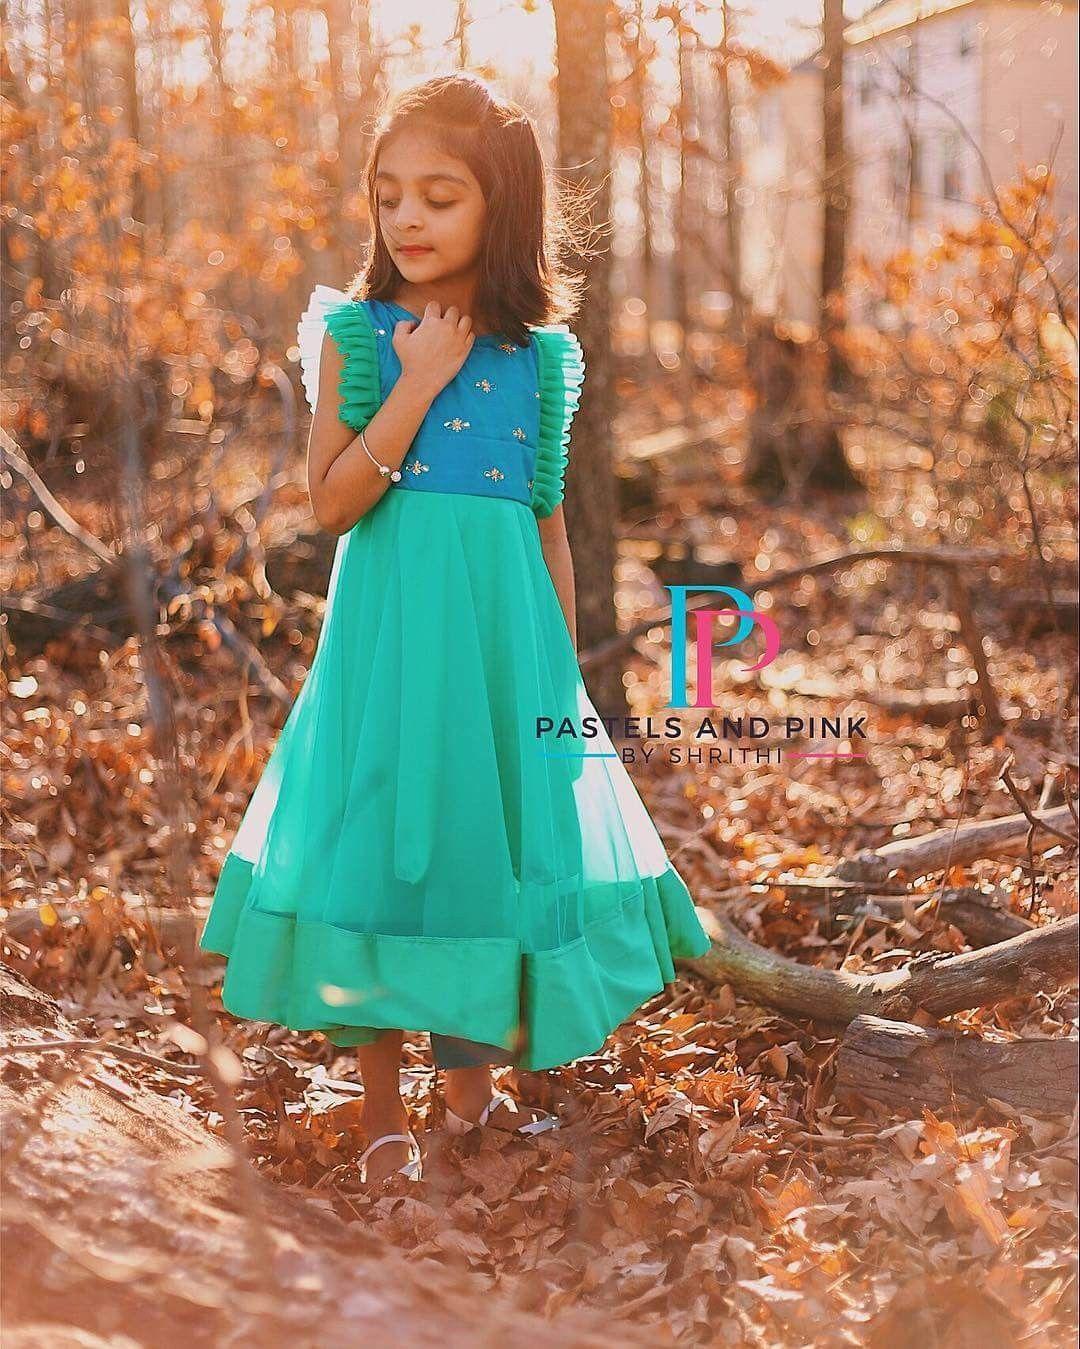 Look at those sweet colors on this sweet doll omg baby n kids